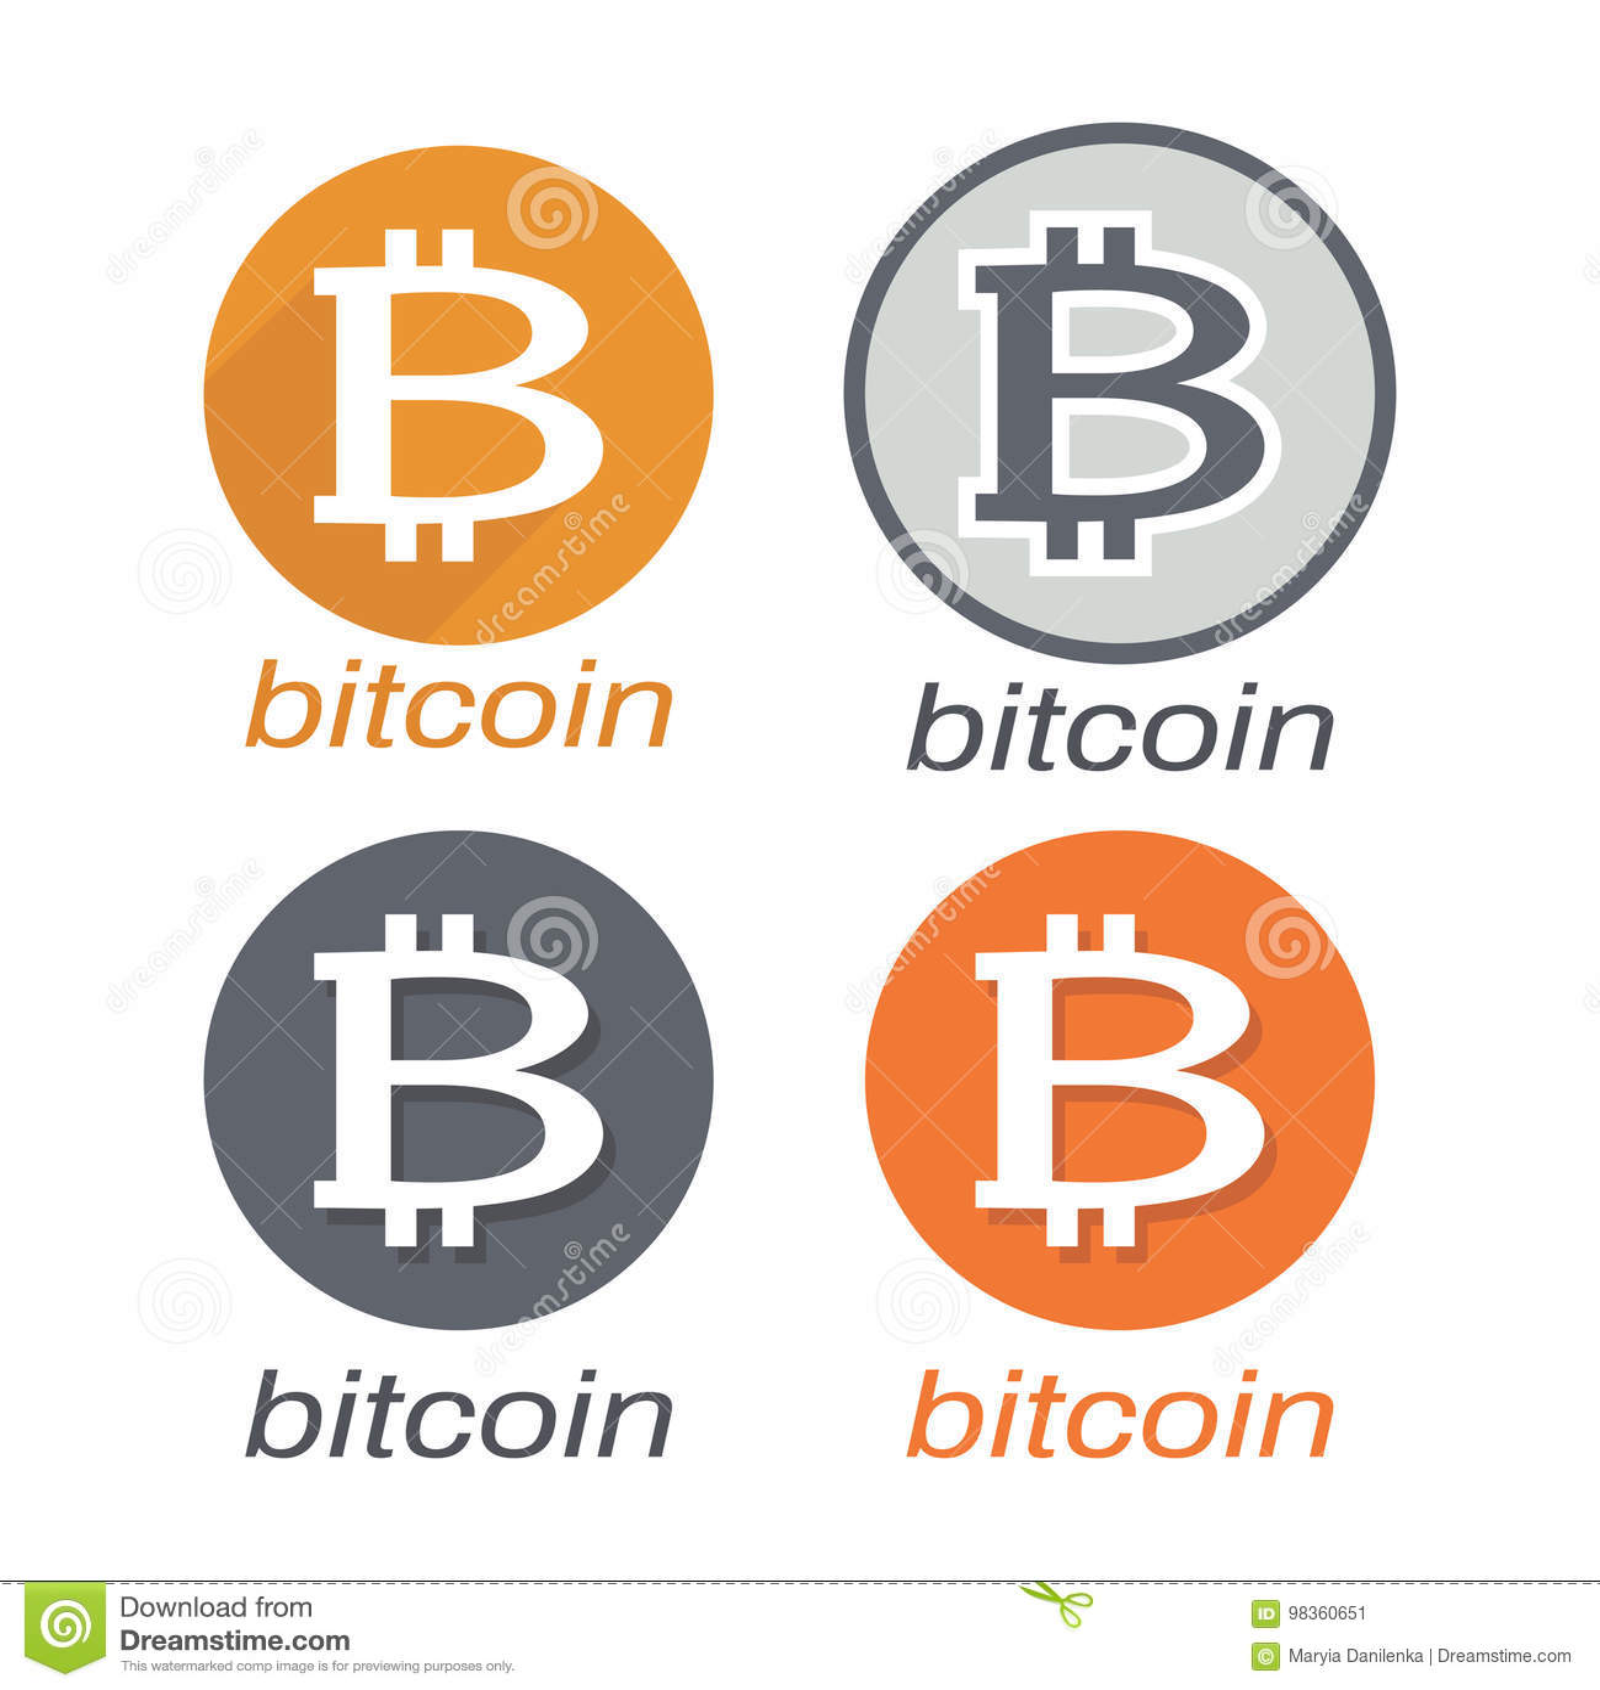 convert dogecoins to bitcoins